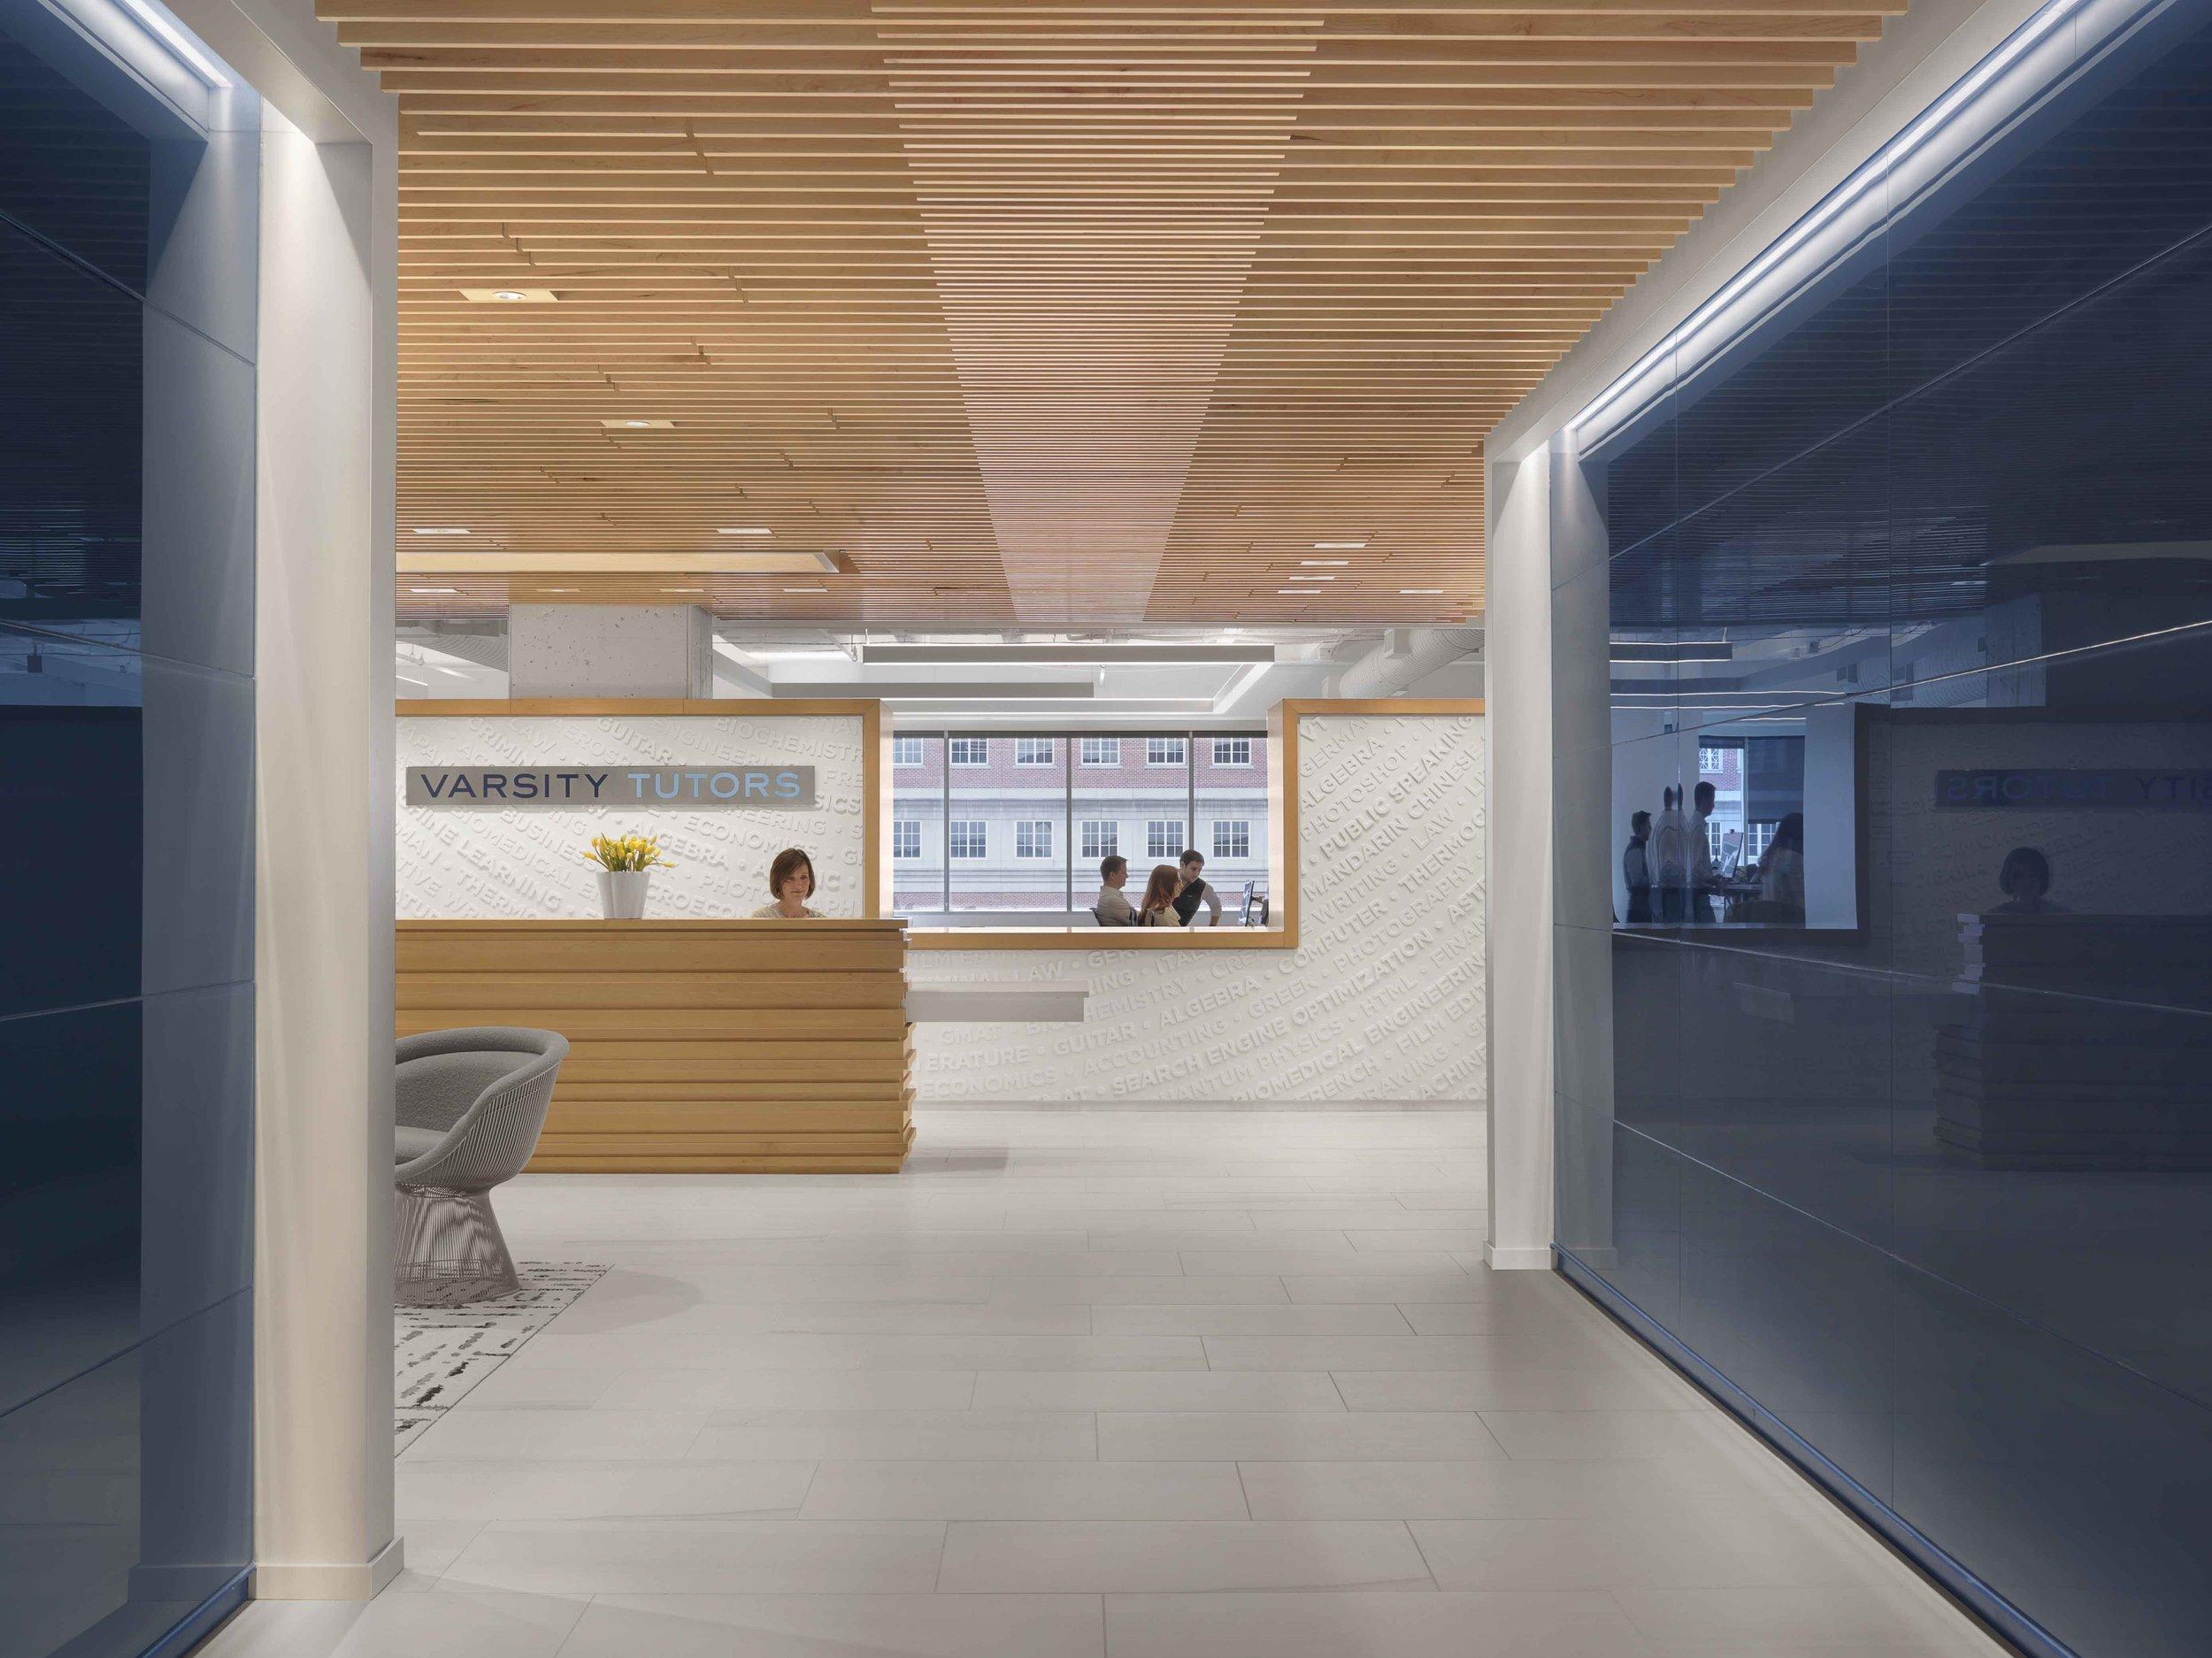 Varsity Tutors Corporate Headquarters